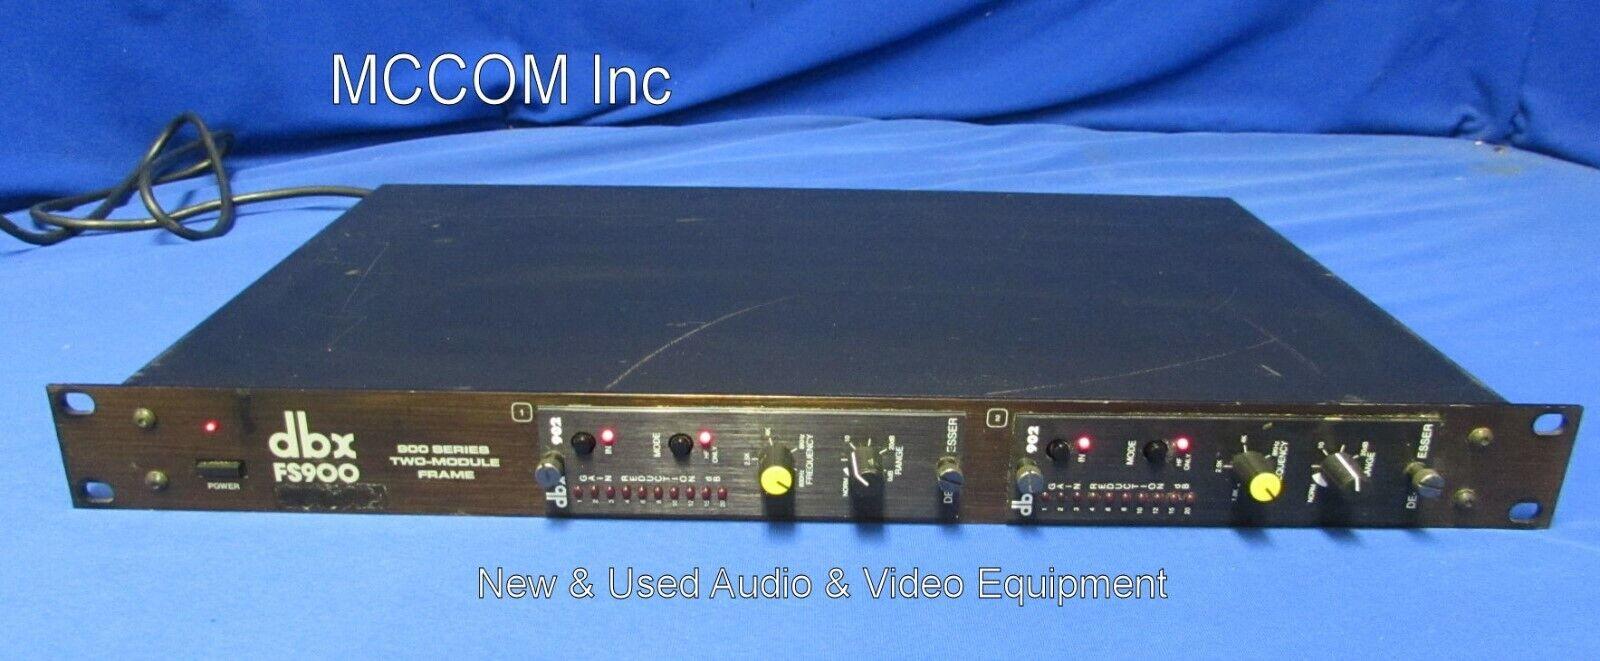 DBX FS900 900 Series 2 Module Frame w  2 DBX902 DE-ESSER Mods